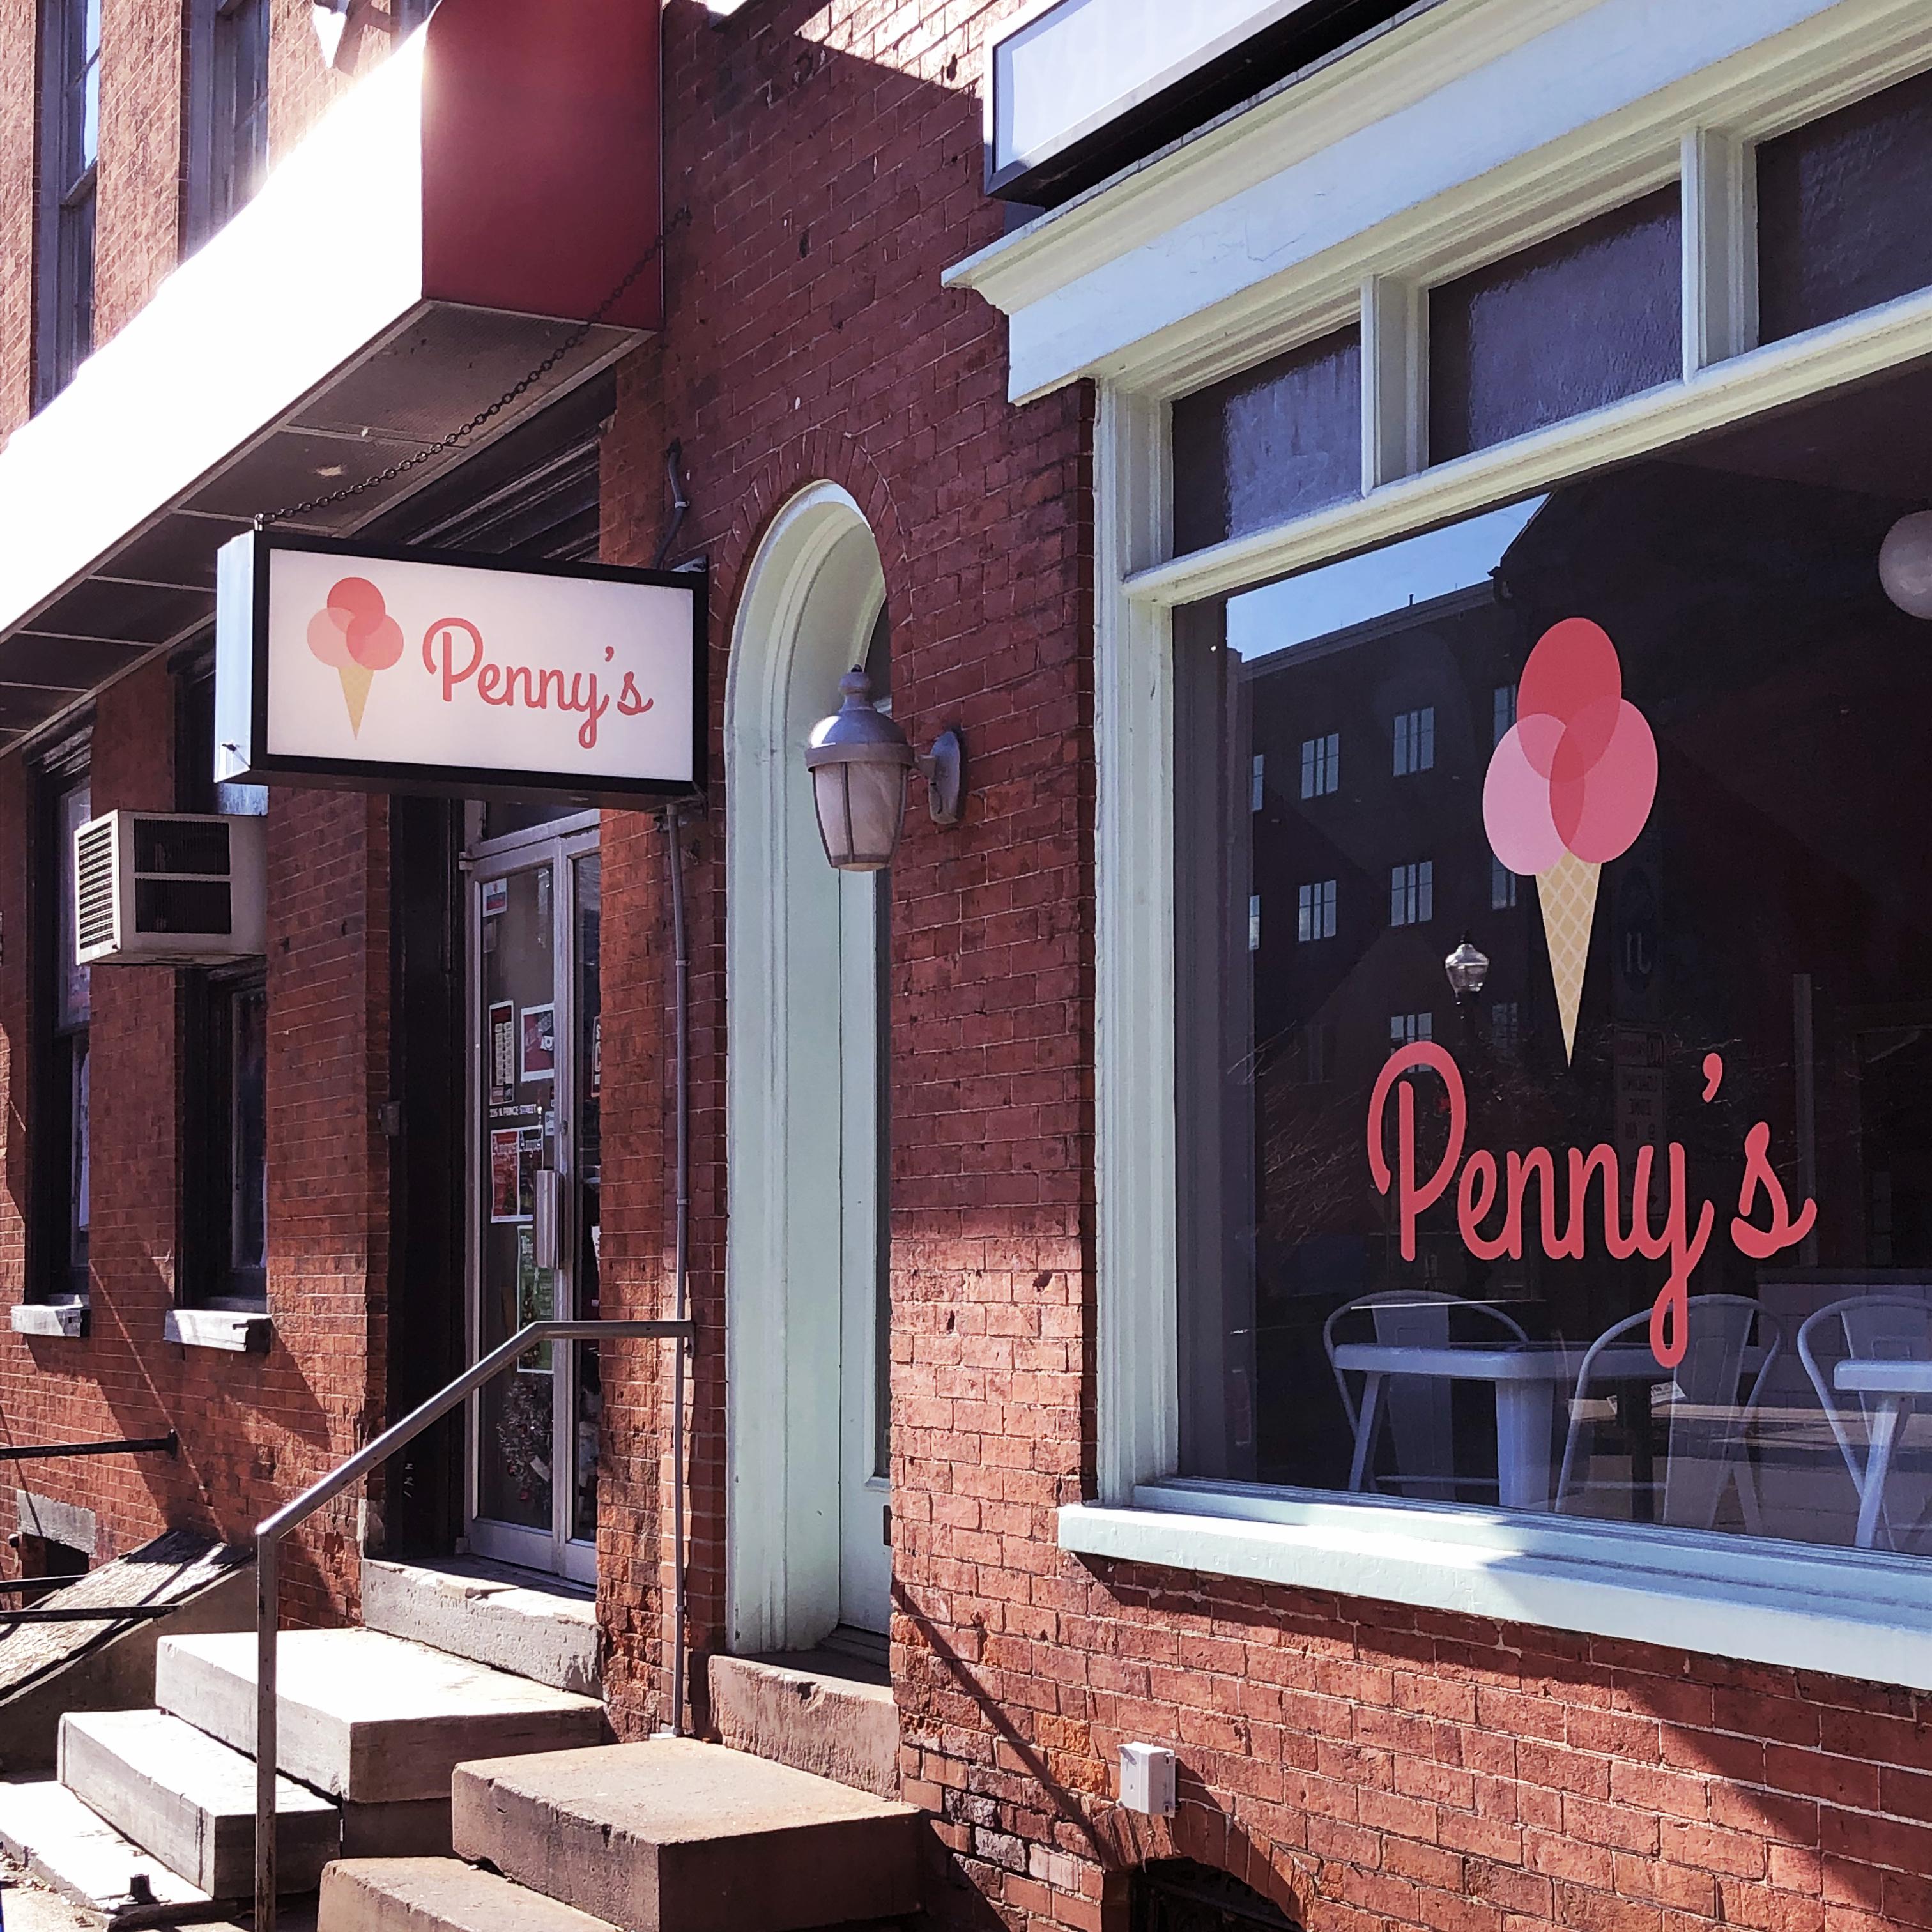 Penny's